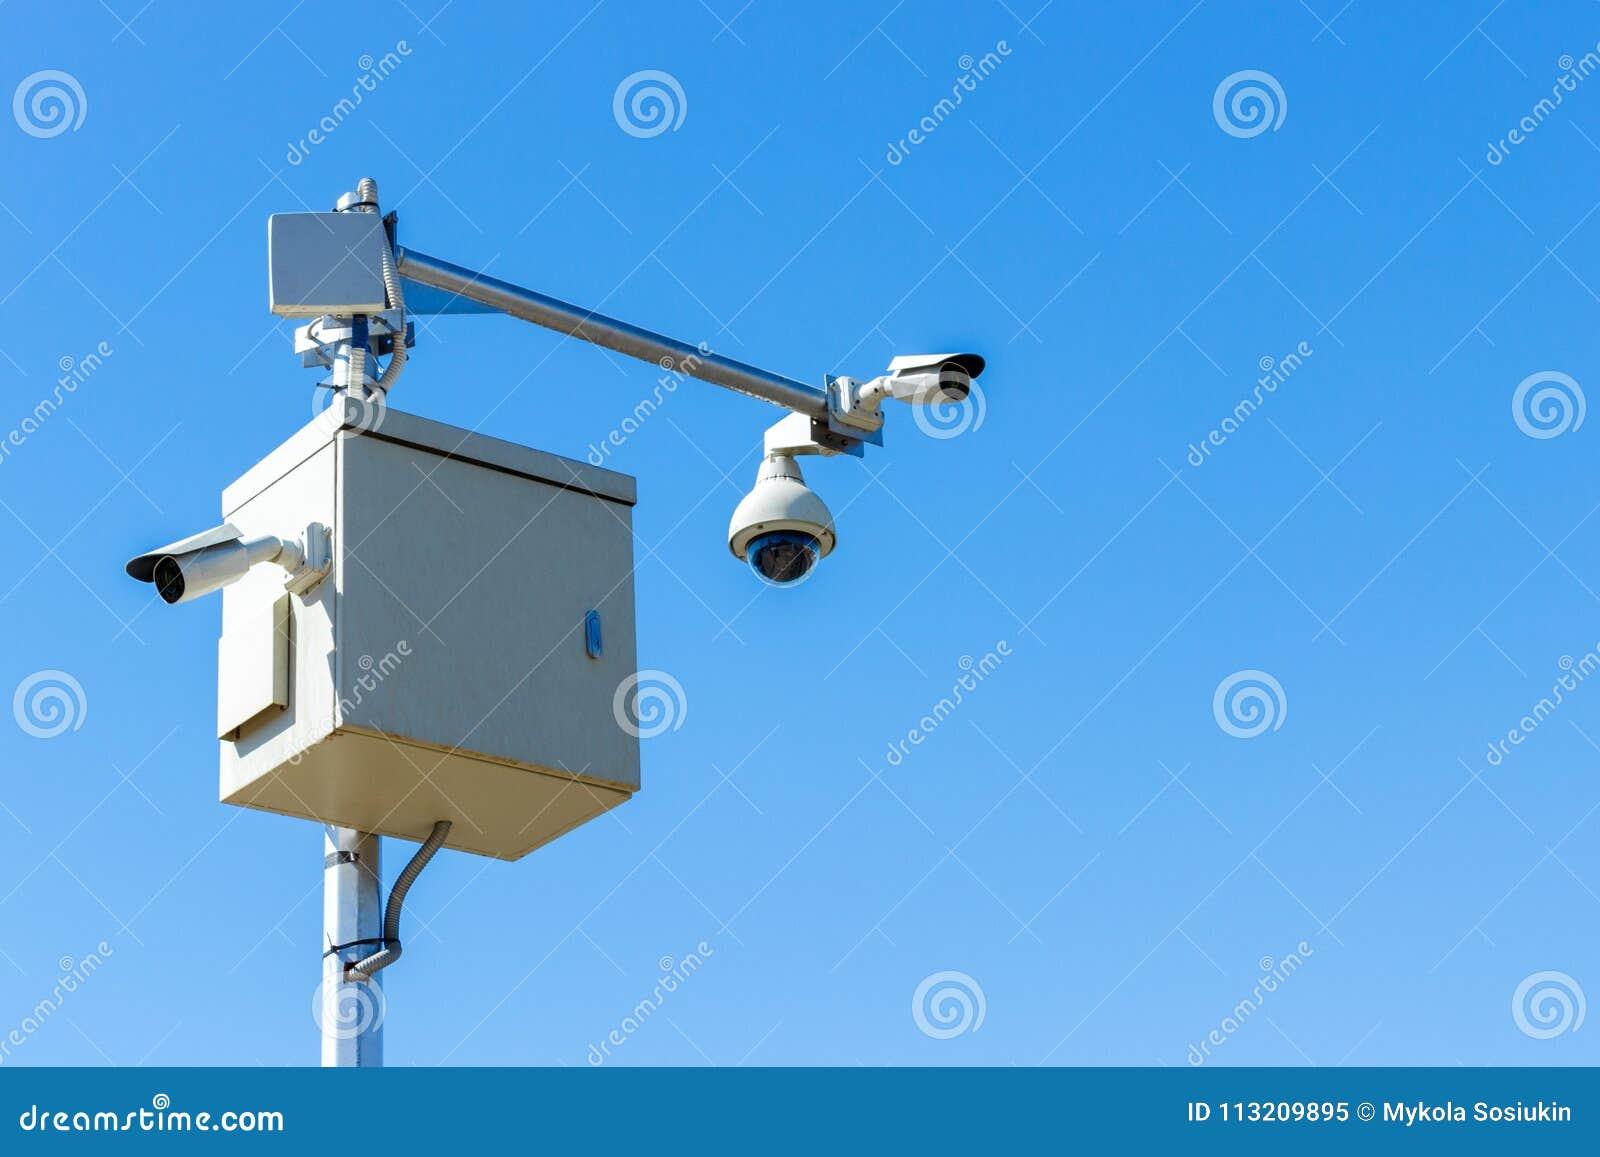 Kabeltelevisie-camera op hemel Infrarode camera als achtergrond en gezoem volgend systeem